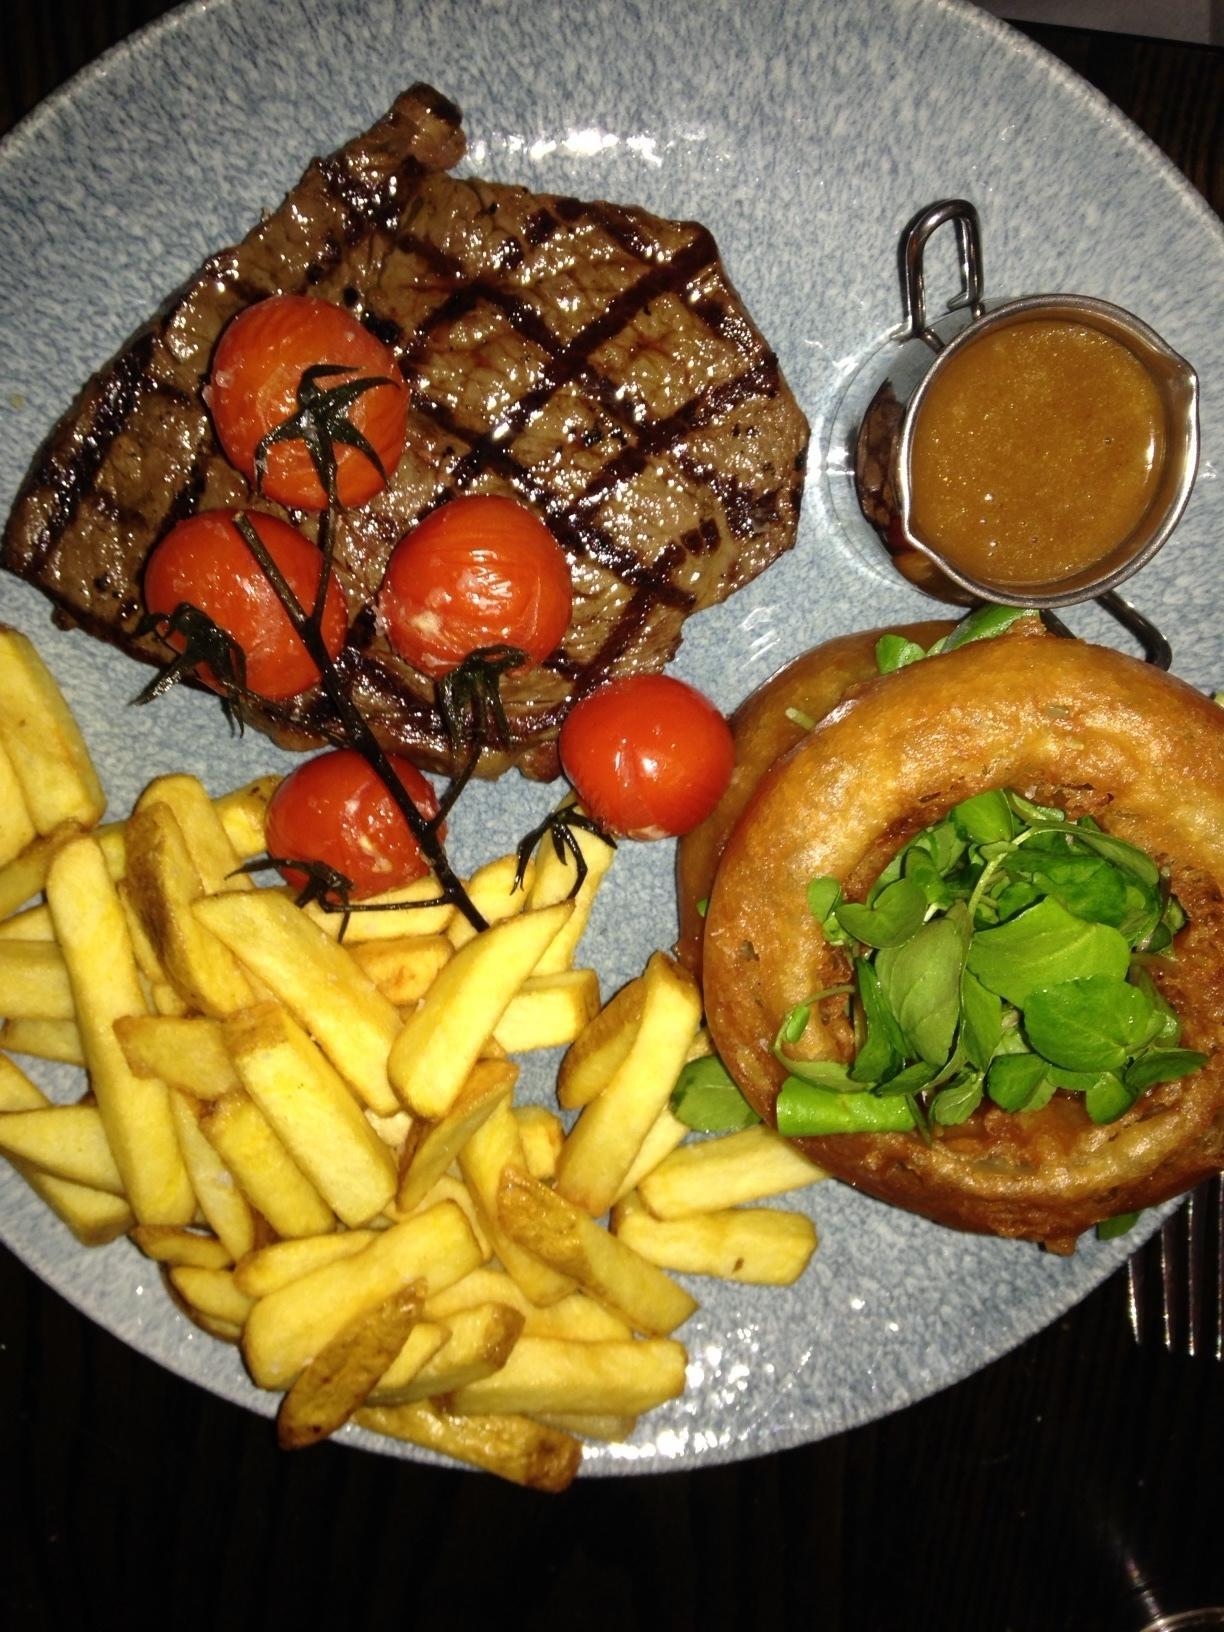 FOOD REVIEW: Chef Joe McCarthy is working his magic at the Wychwood Inn, Shipton-under-Wychwood